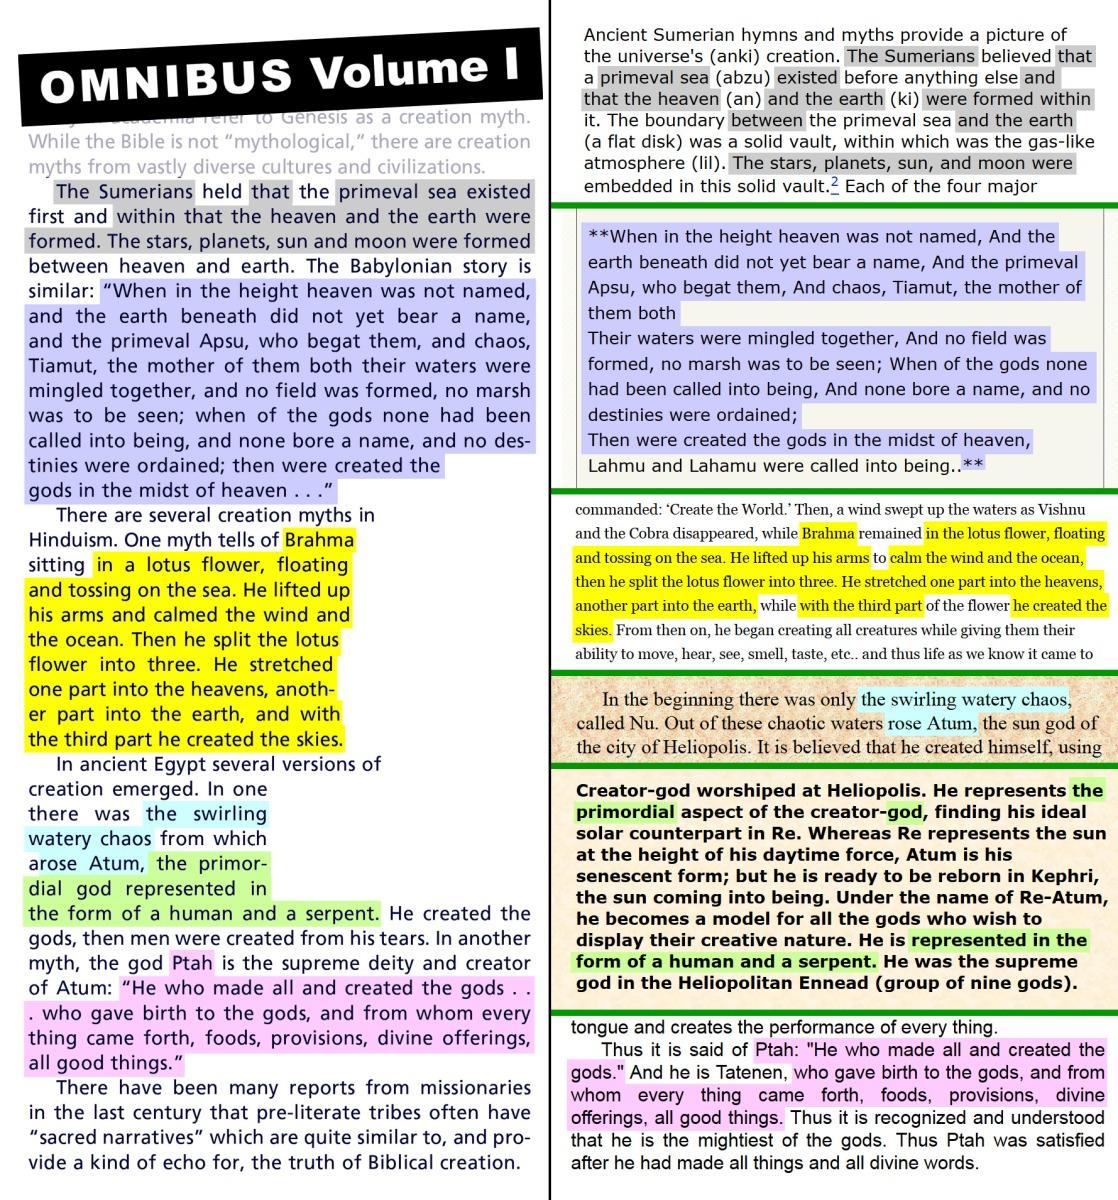 Volume I page 111